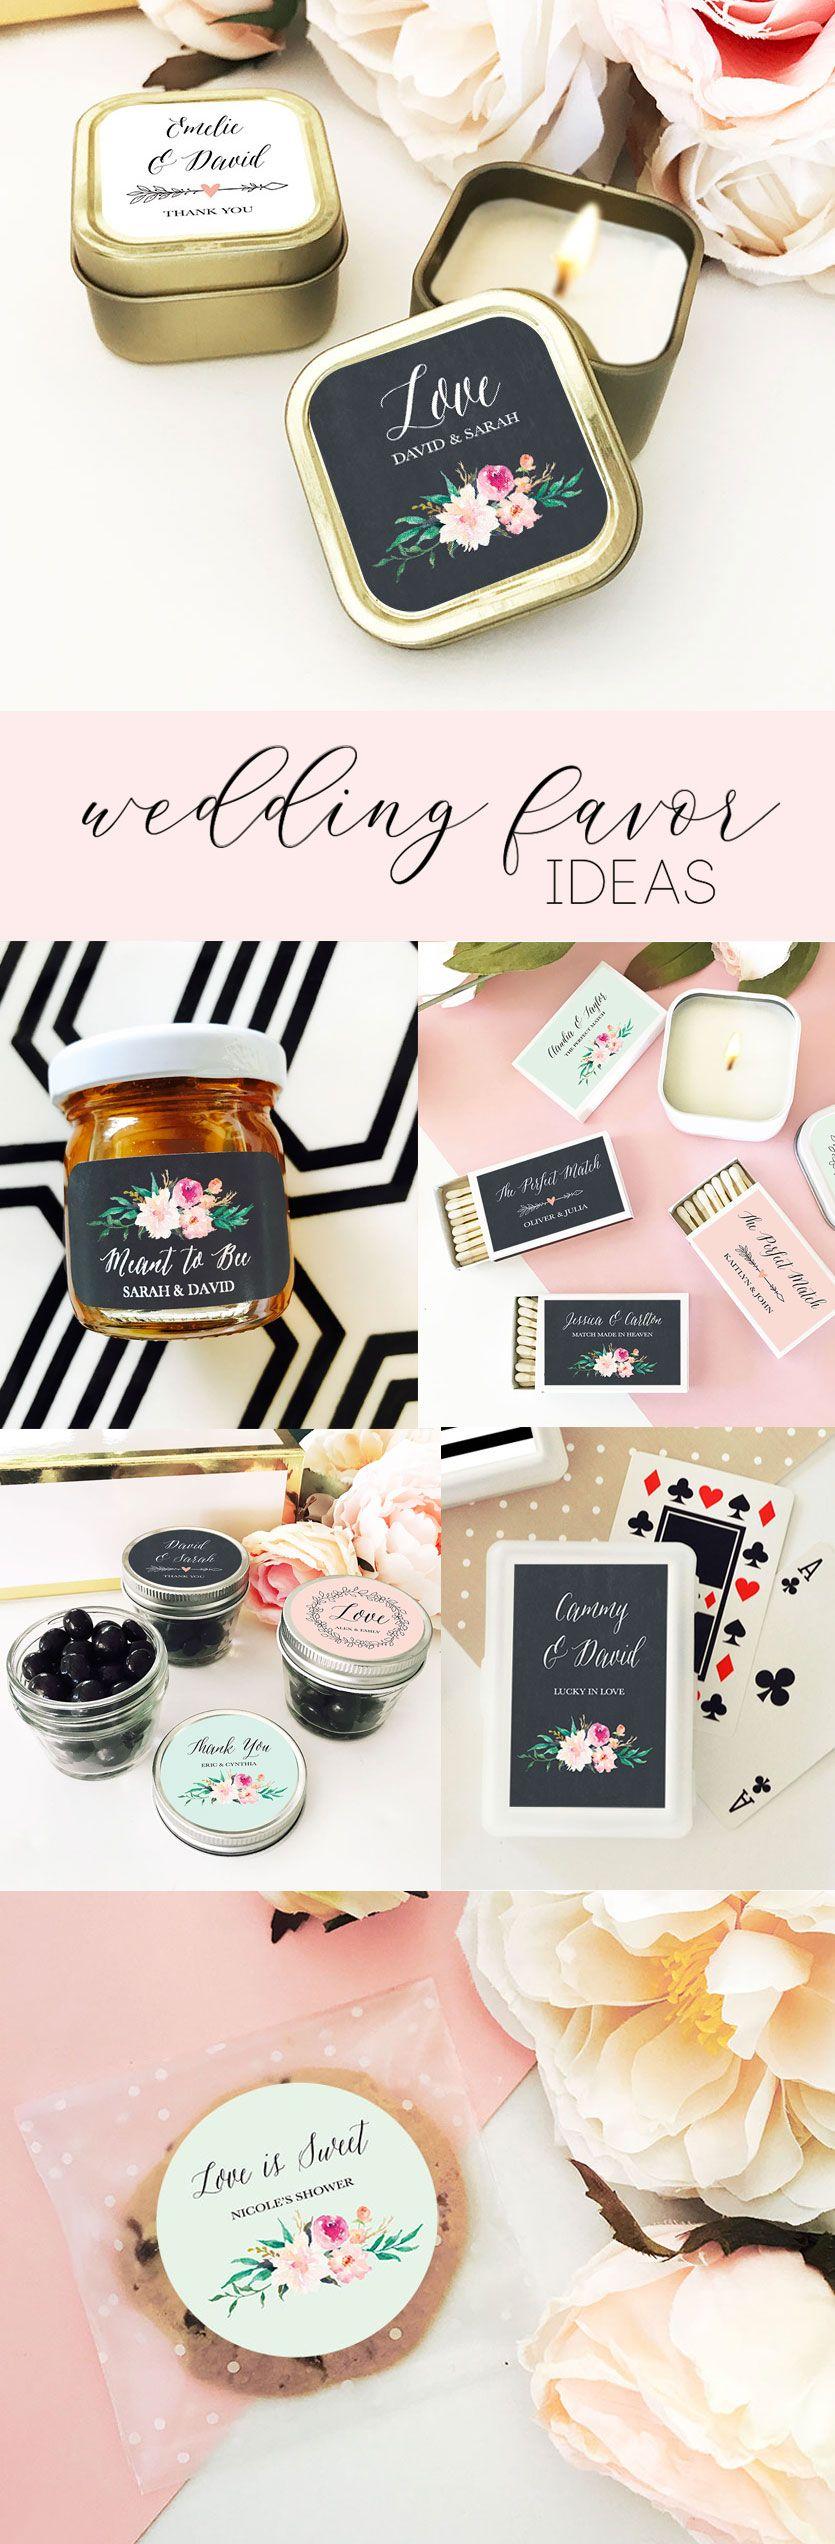 Unique Wedding Favor Ideas | Floral Favors for Weddings | Useful ...